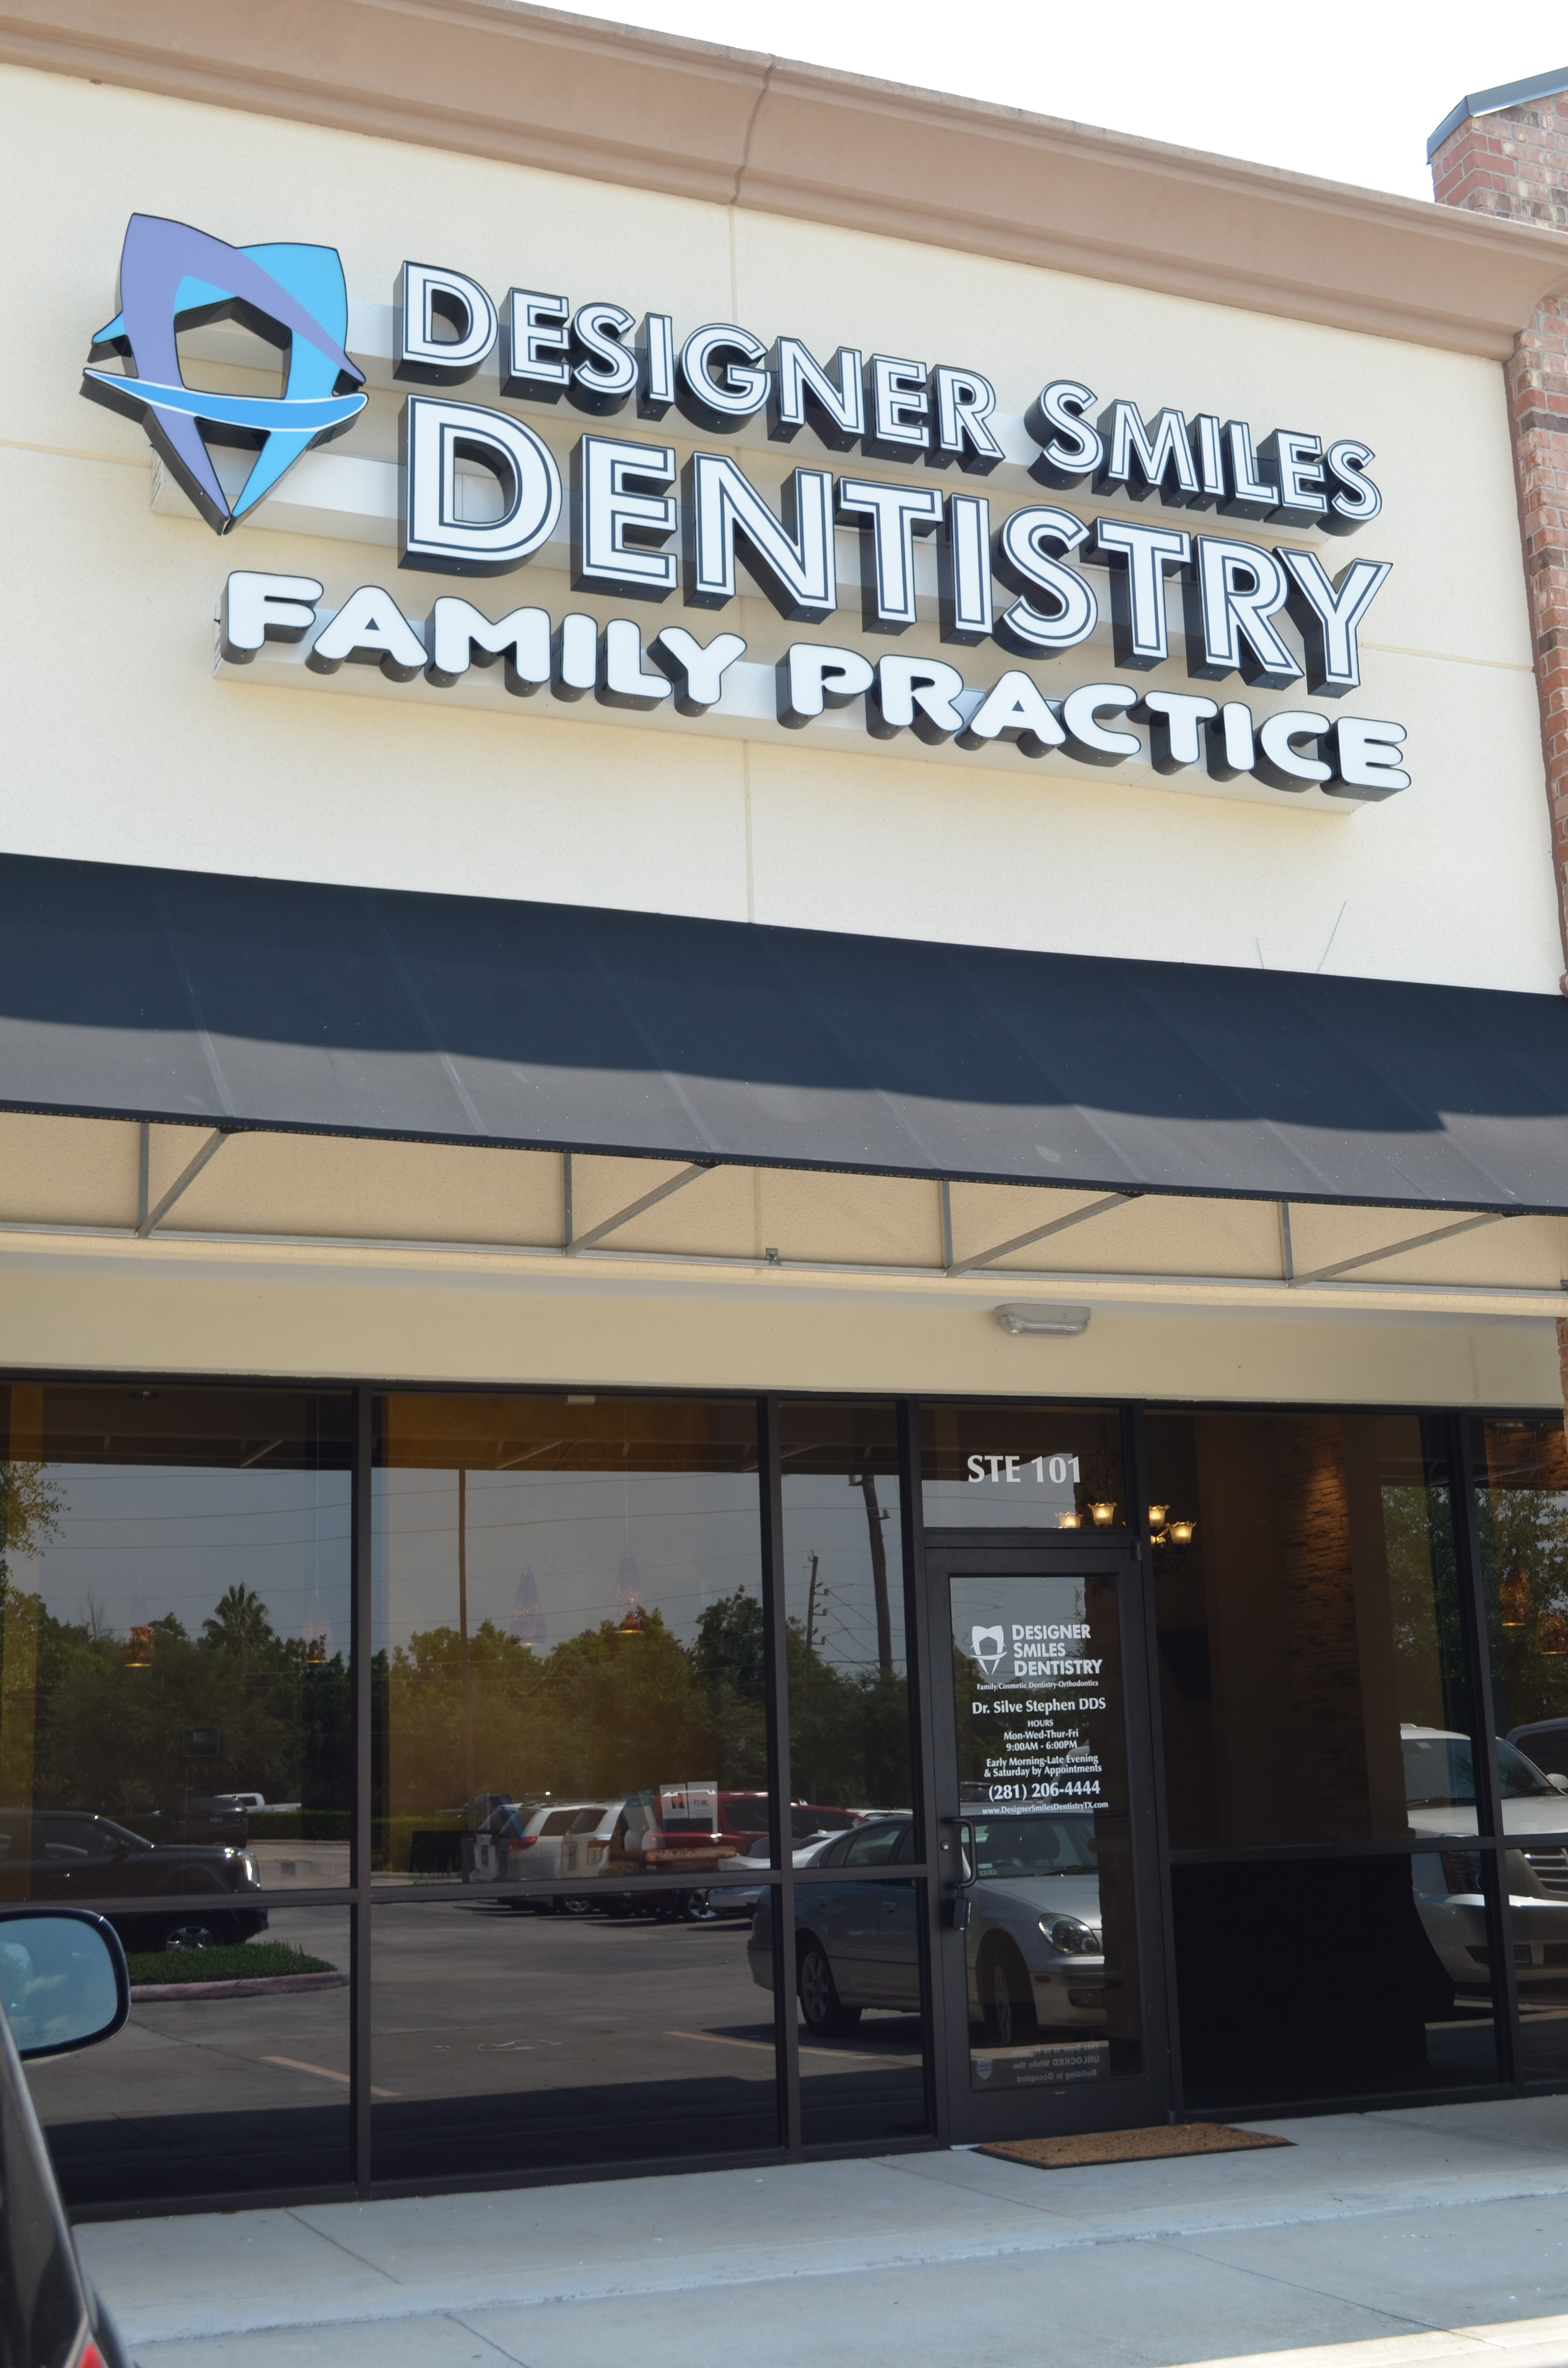 Designer Smiles Dentistry In Missouri City, TX 77459